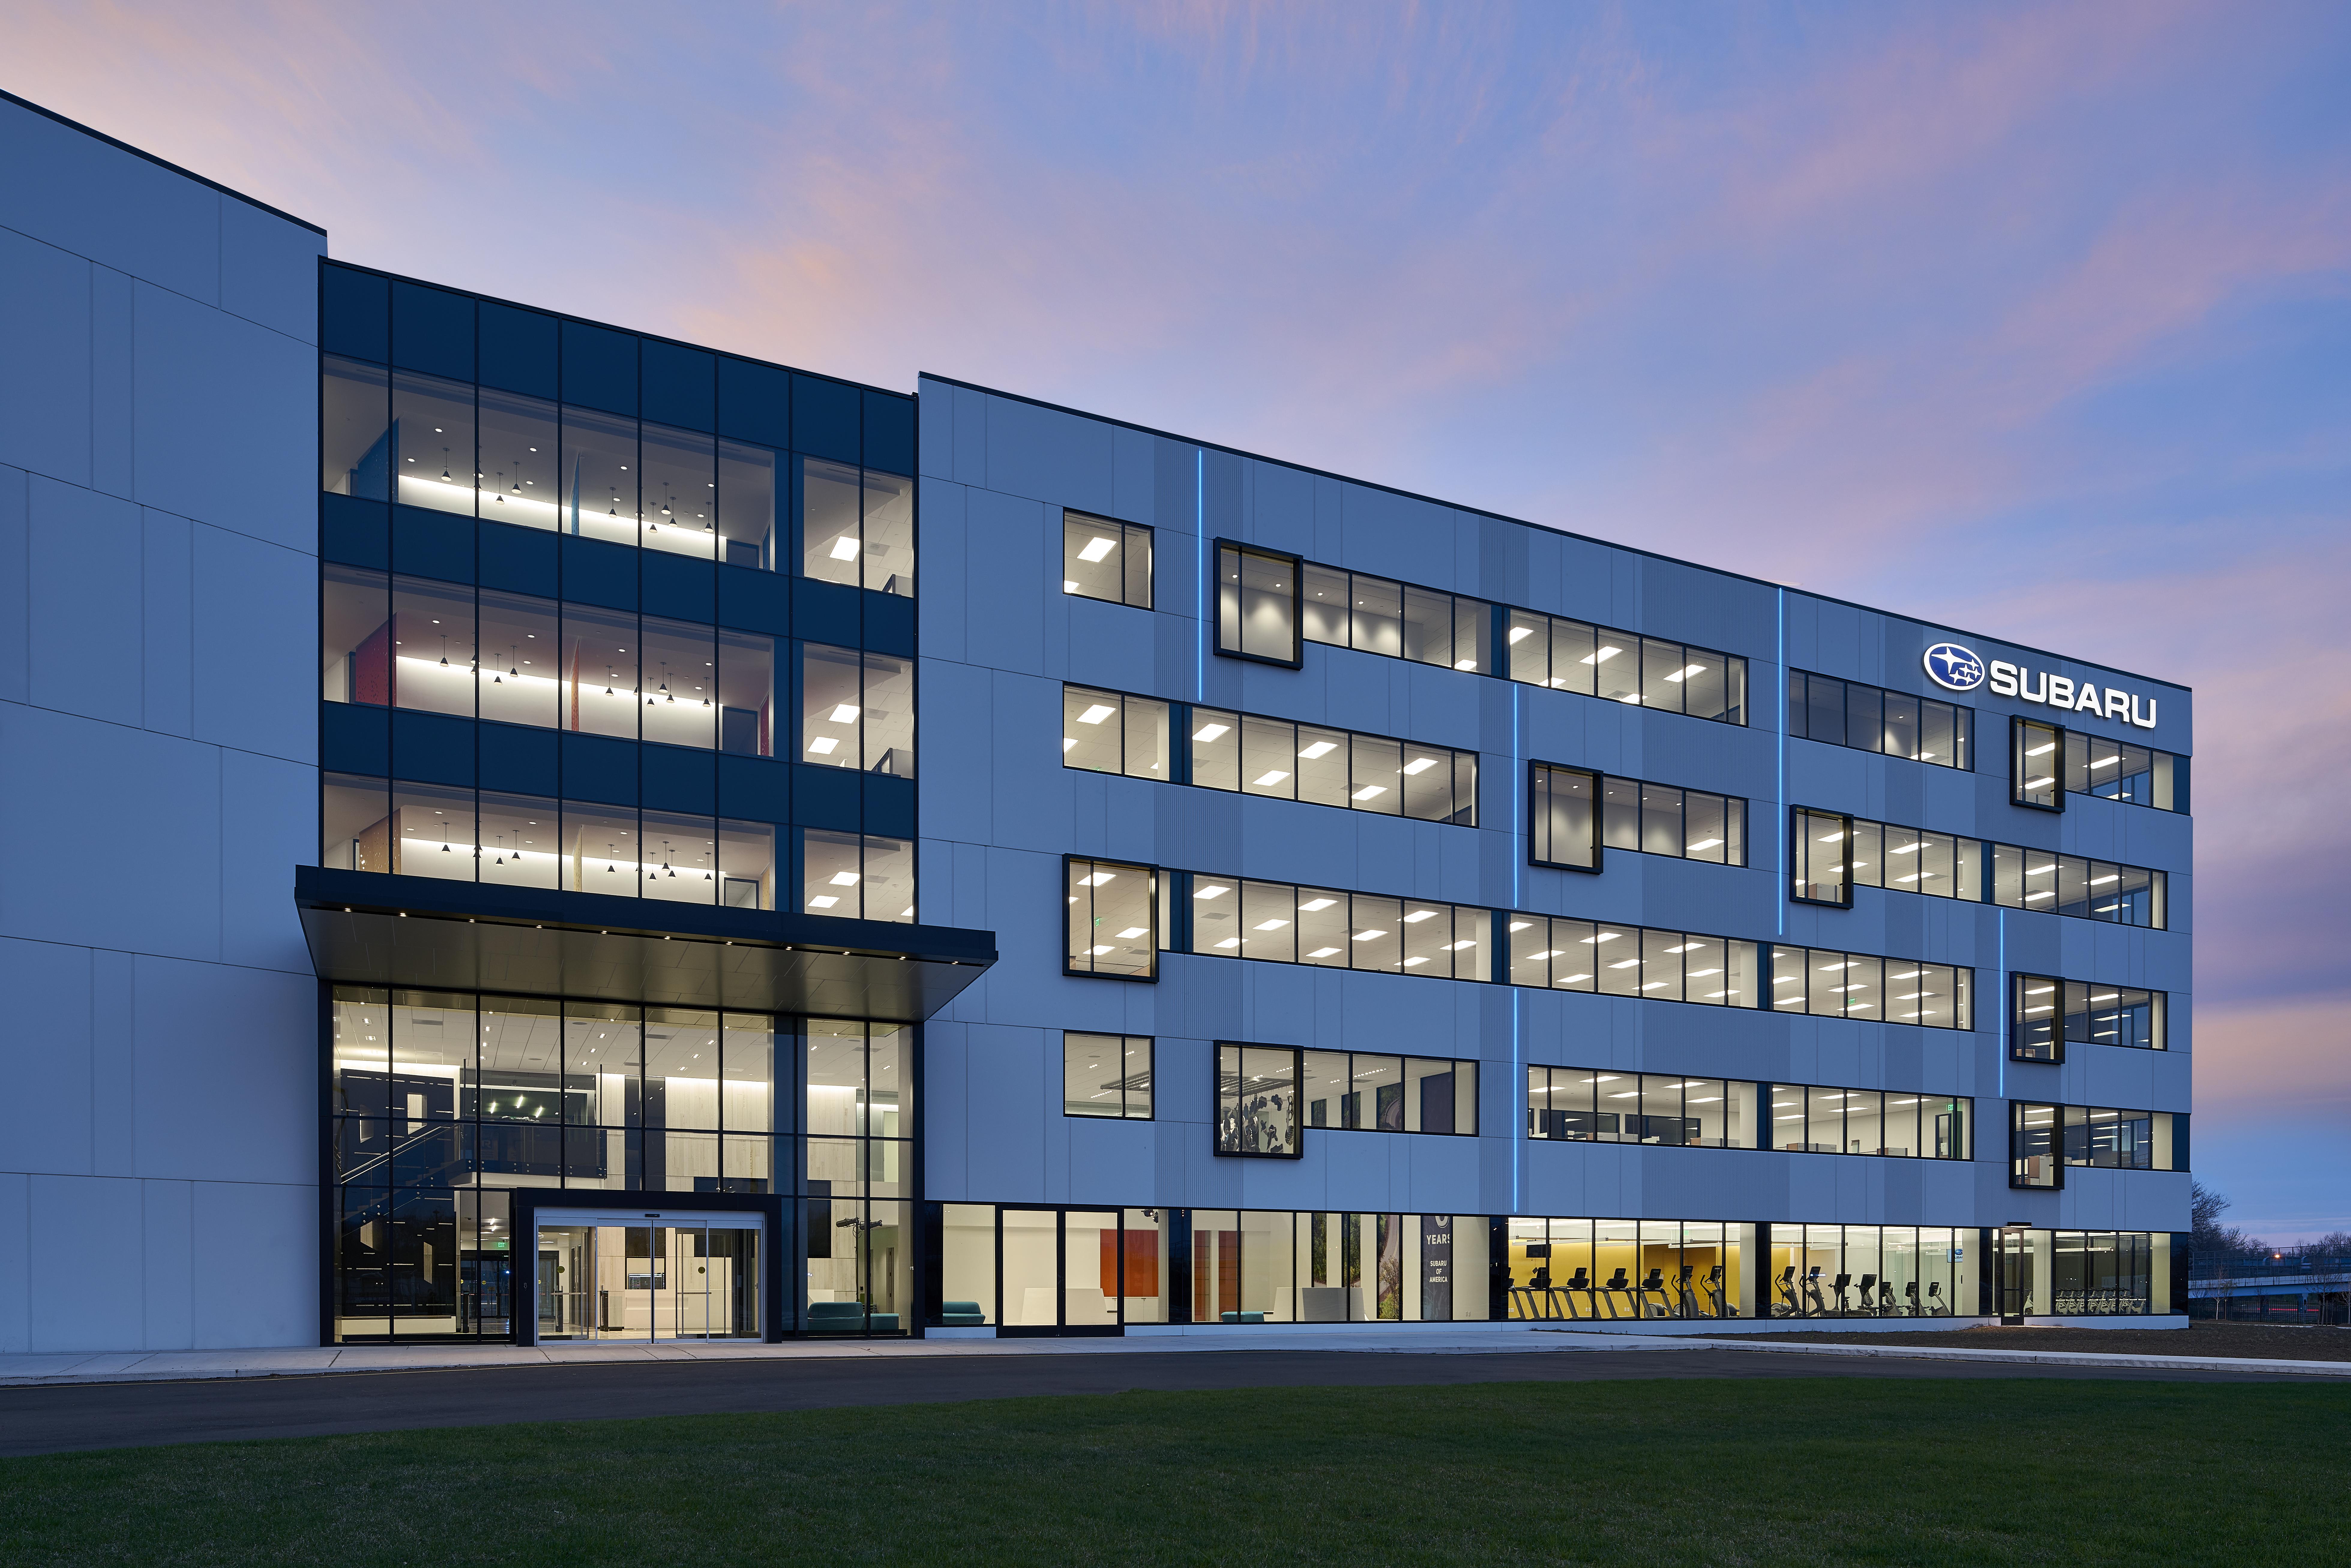 Photo of new Camden, N.J. headquarters courtesy of Subaru.